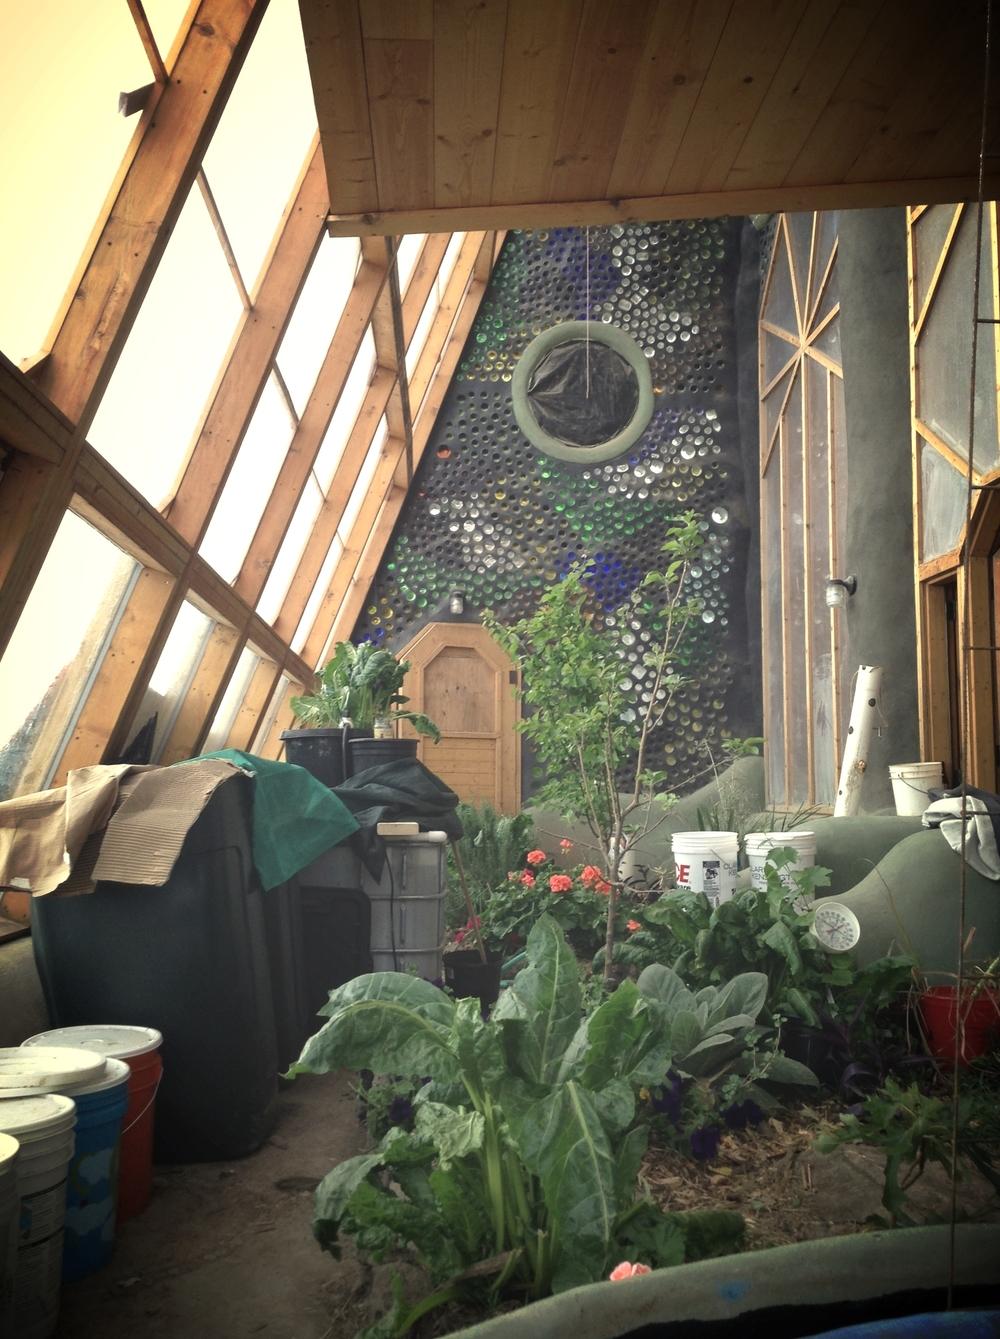 Greenhouse under construction.